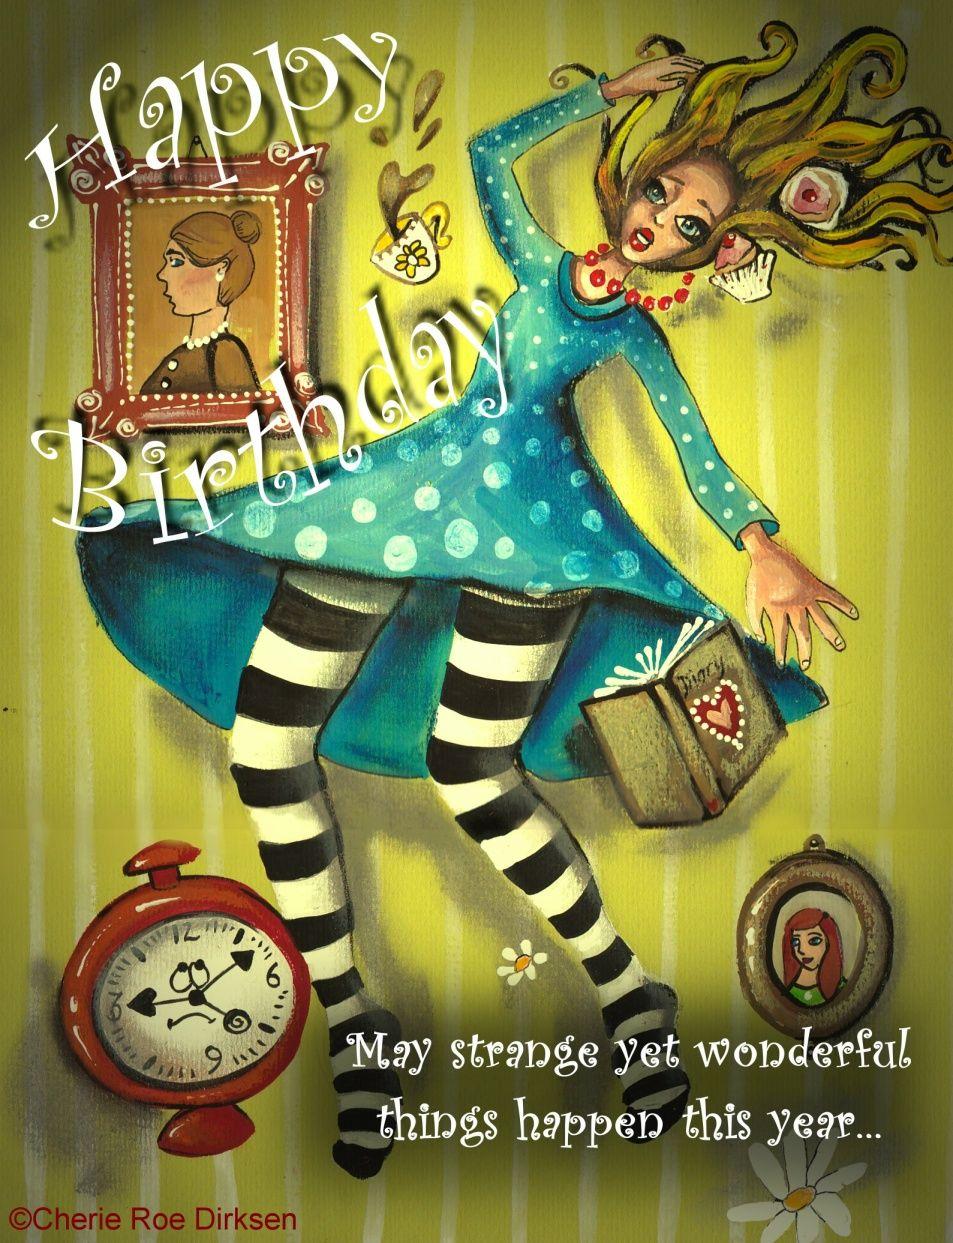 Alice birthday ecardg 9531243 parabens pinterest alice birthday e card by cherie roe dirksen kristyandbryce Choice Image